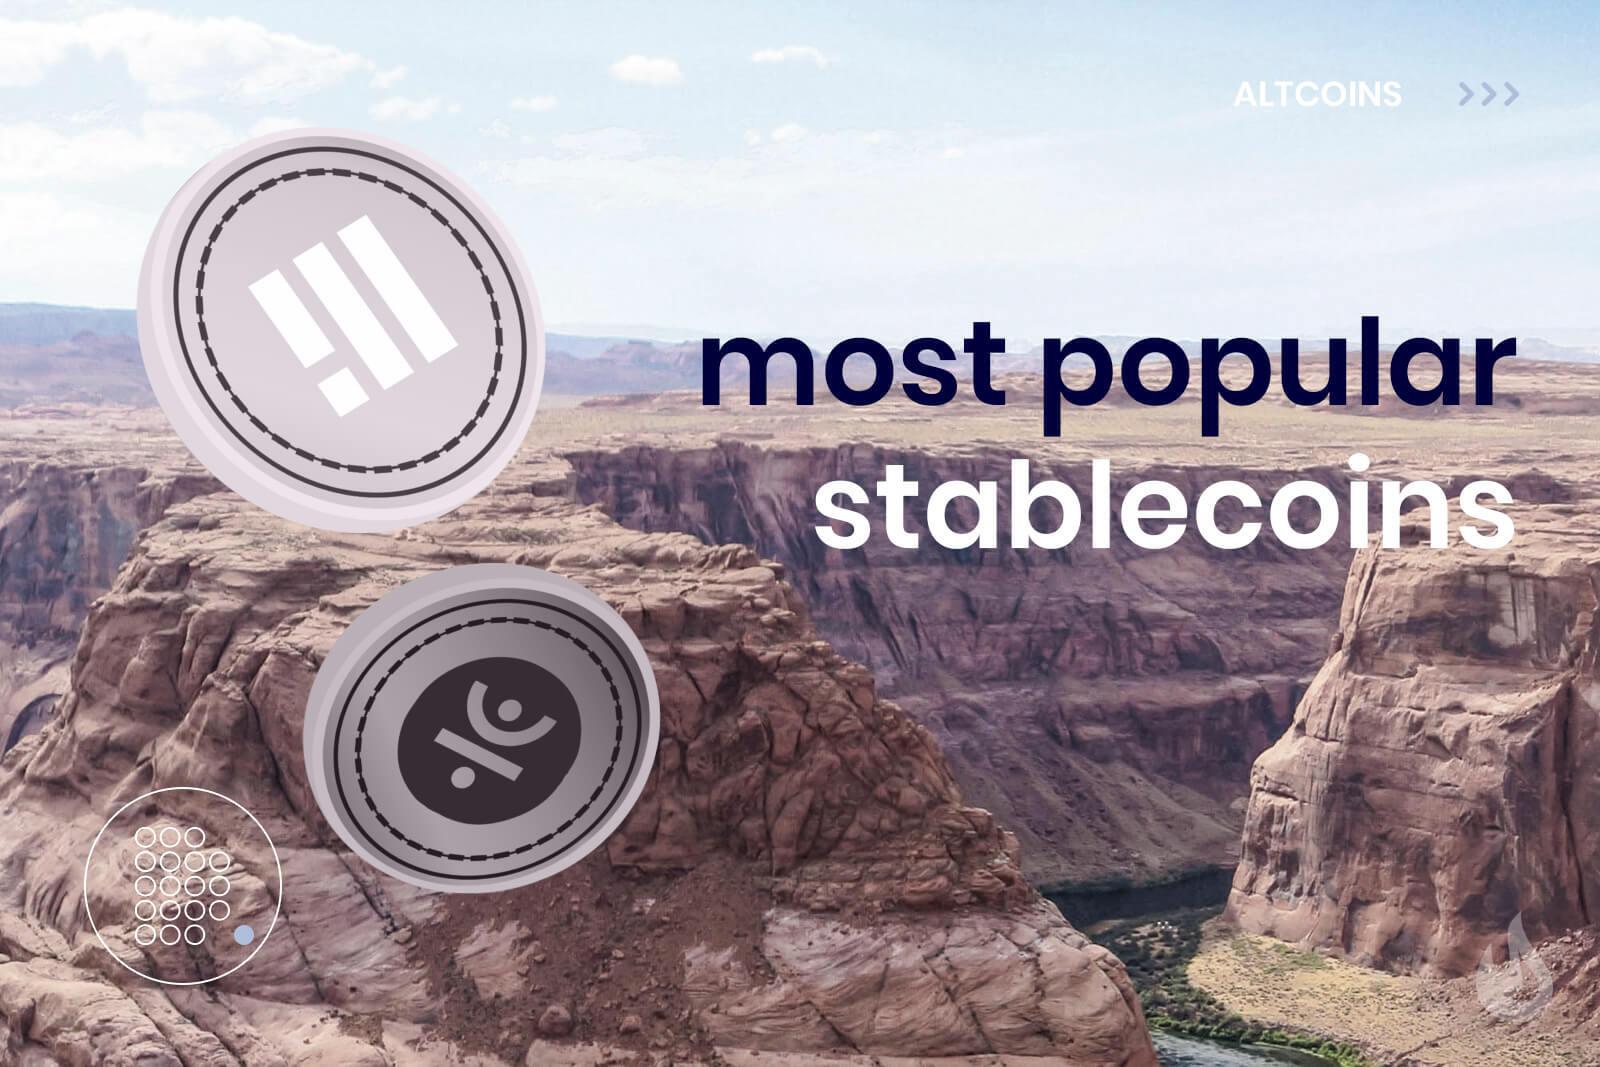 Most popular stablecoins